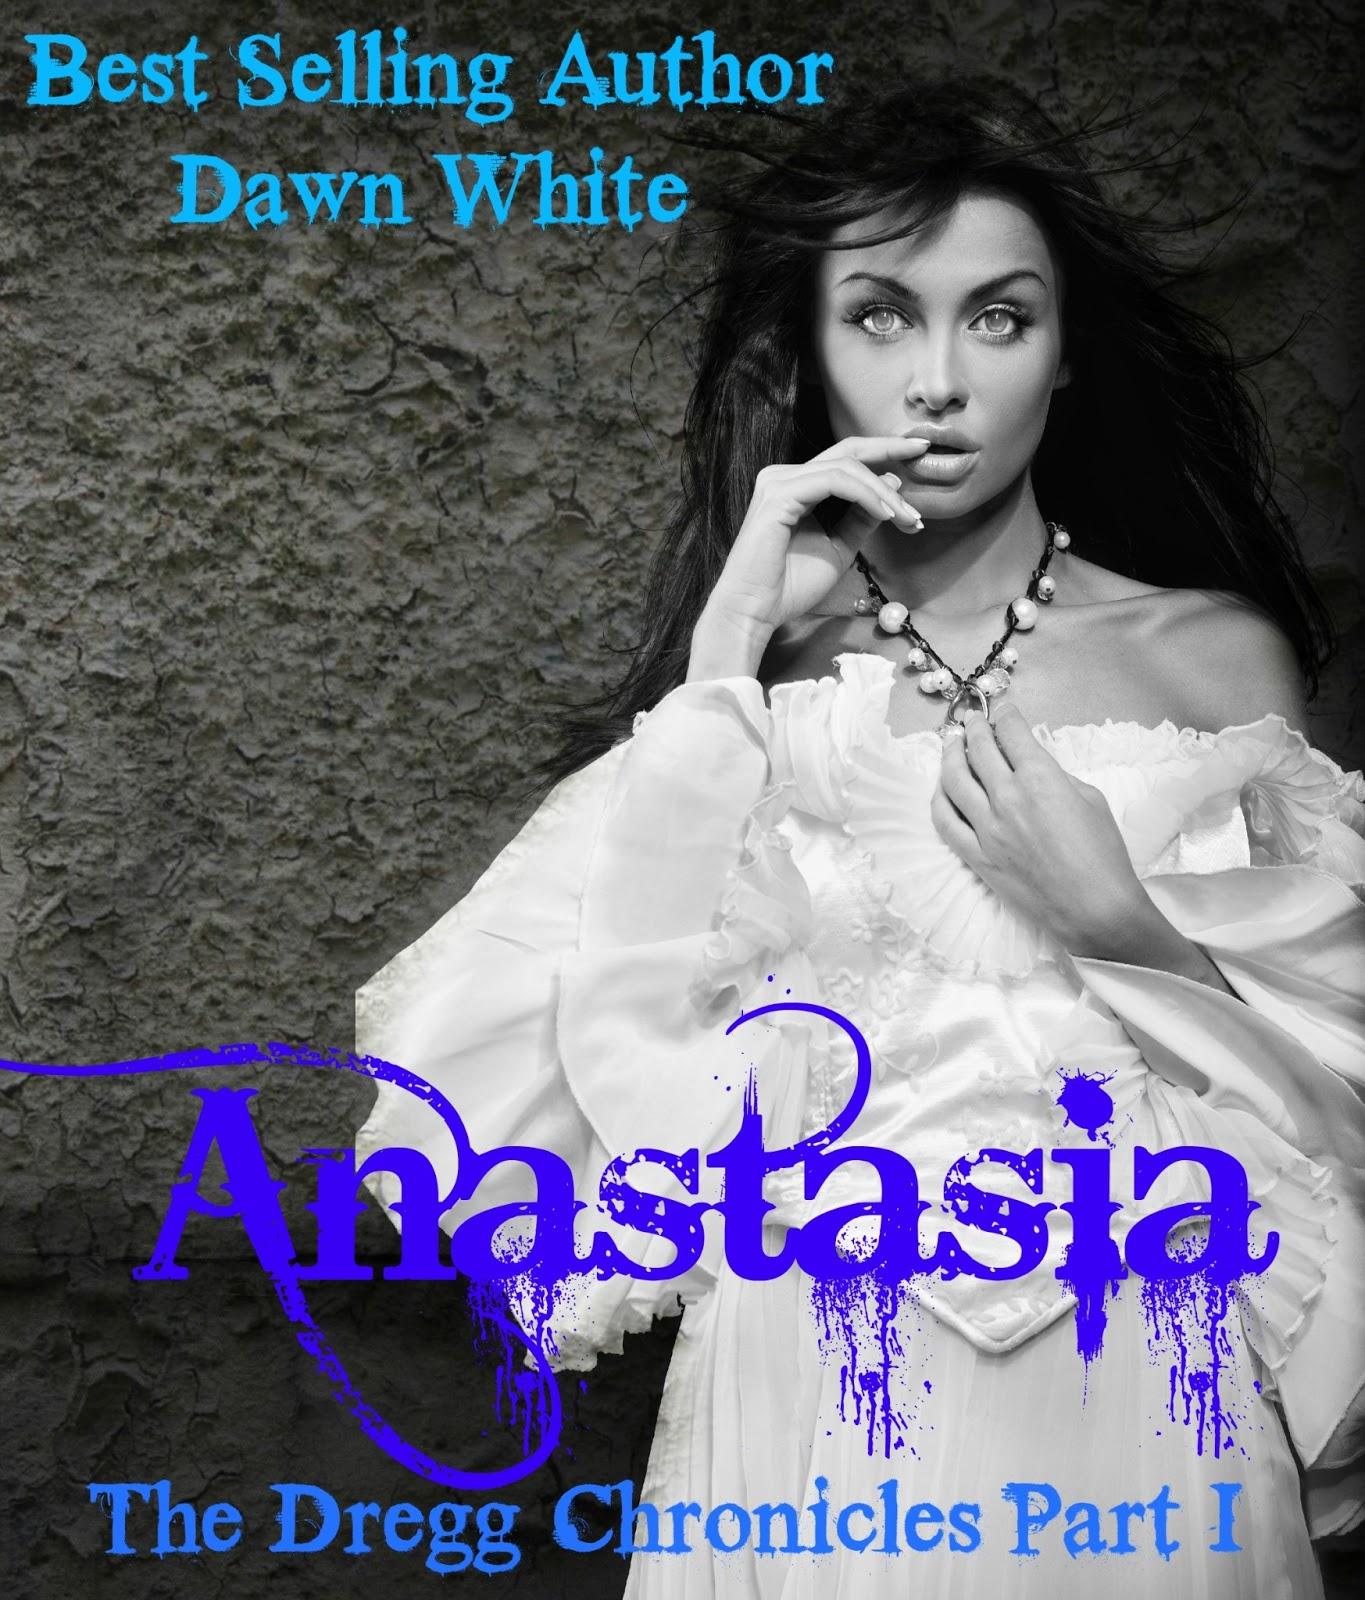 http://2.bp.blogspot.com/-yZJkf3fyoQ8/UVeXkKXpGZI/AAAAAAAAGkg/ewFoxkGFmBU/s1600/Anastasia+part+1.jpg